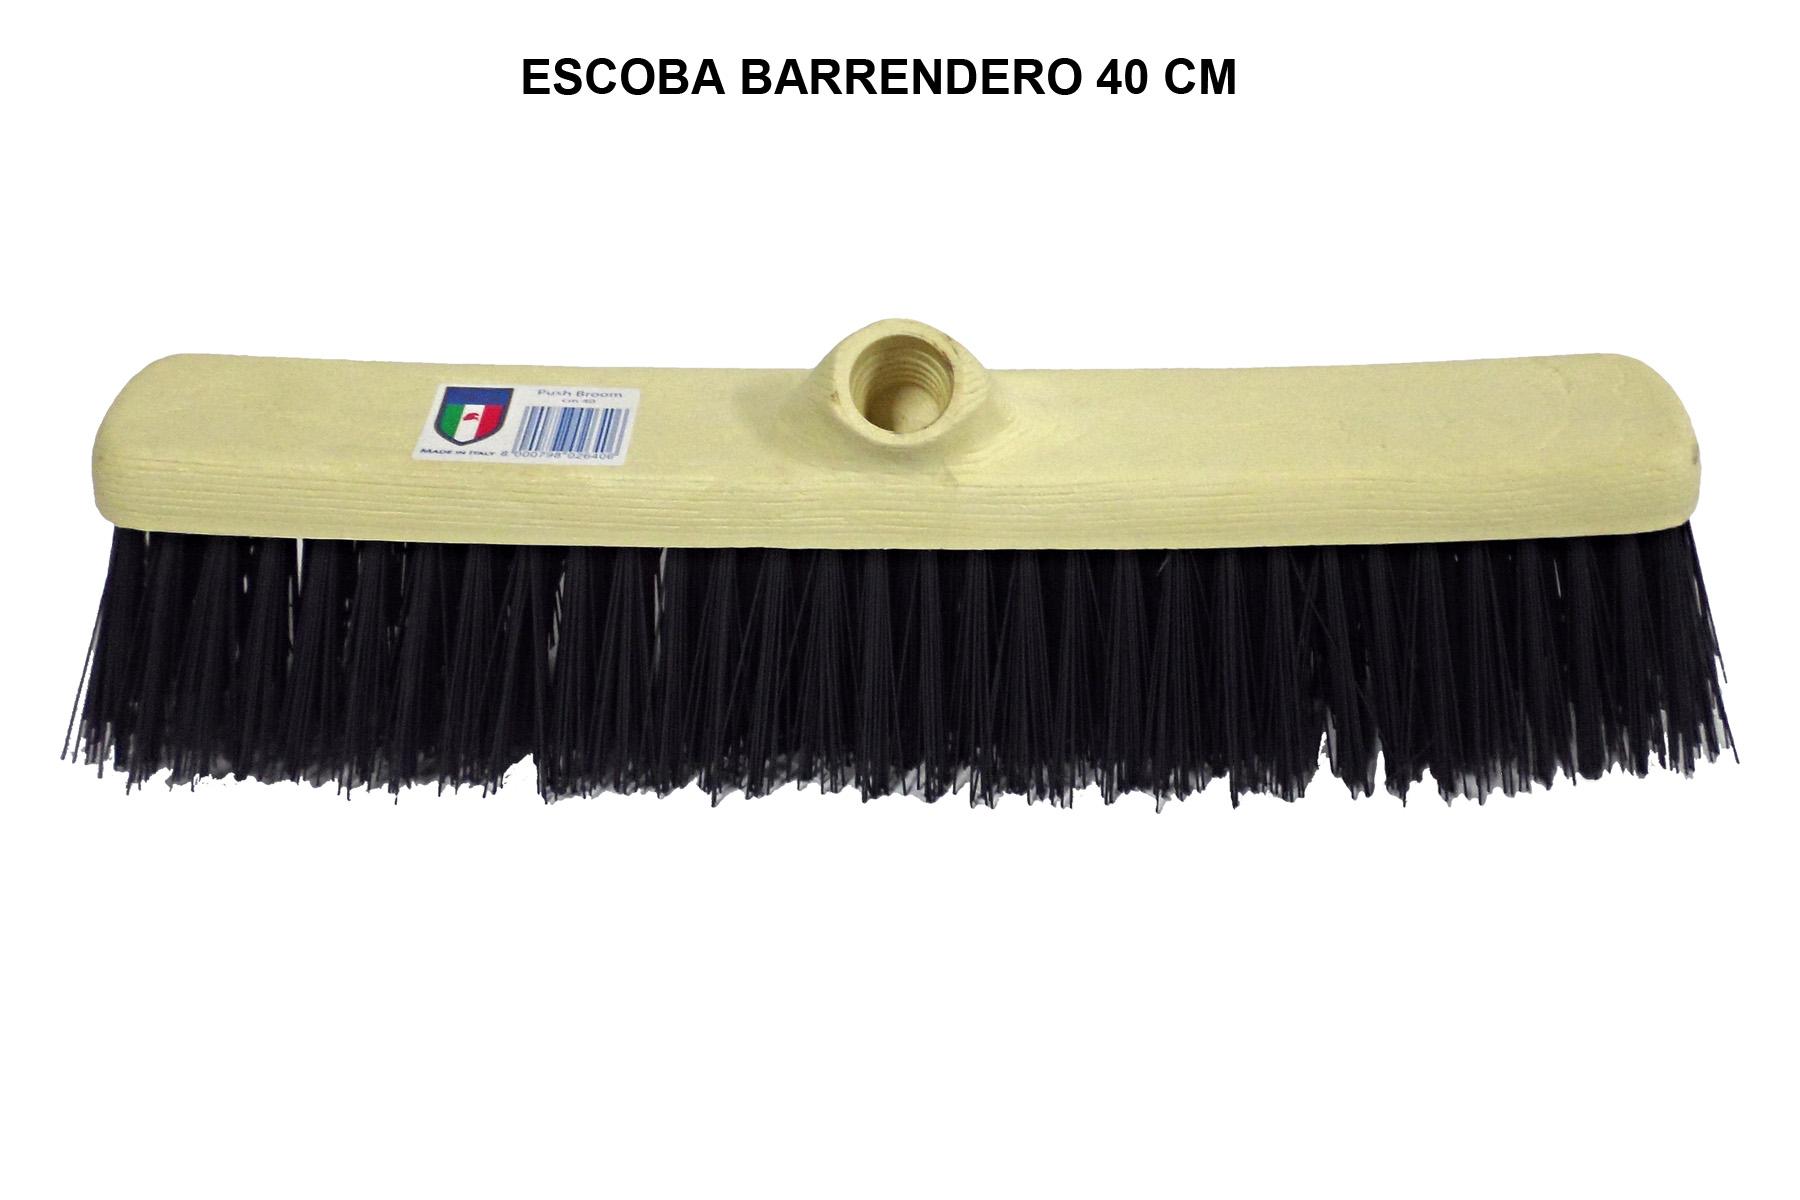 ESCOBA BARRENDERO 40 CM